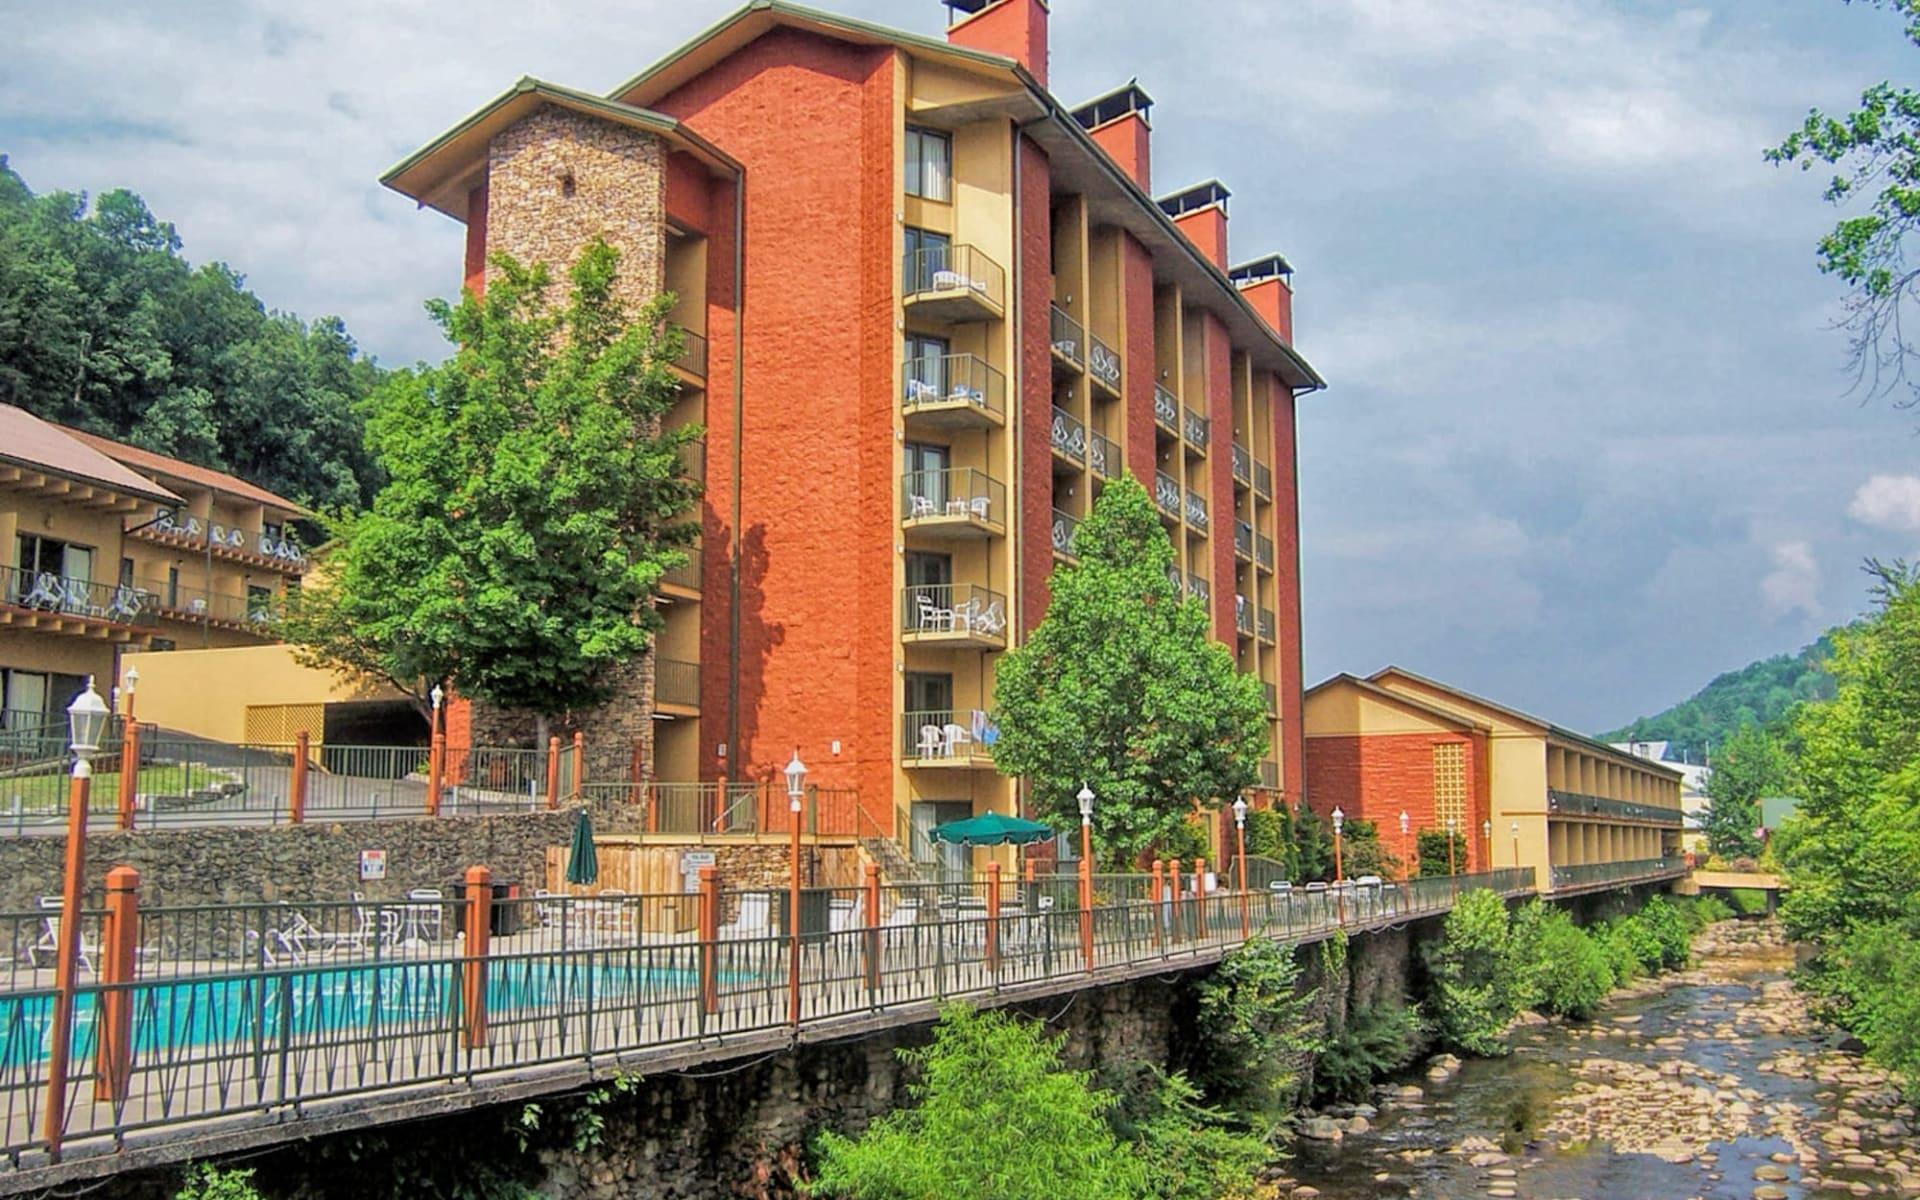 River Terrace Resort in Gatlinburg: Exterior_River Terrace Resort_Aussenansicht 1_Tourmappers